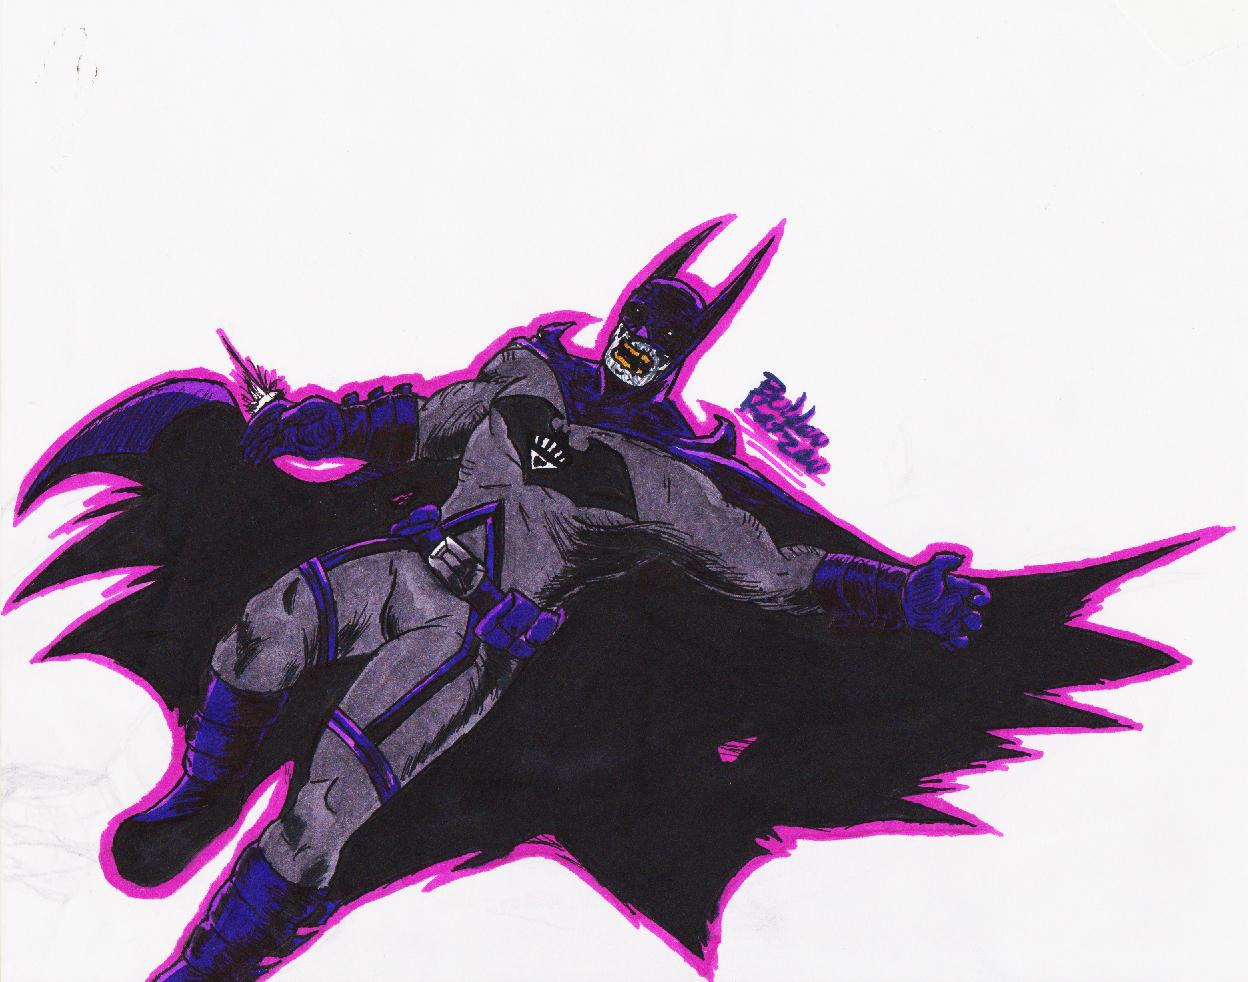 Inktober: Blackest Knight